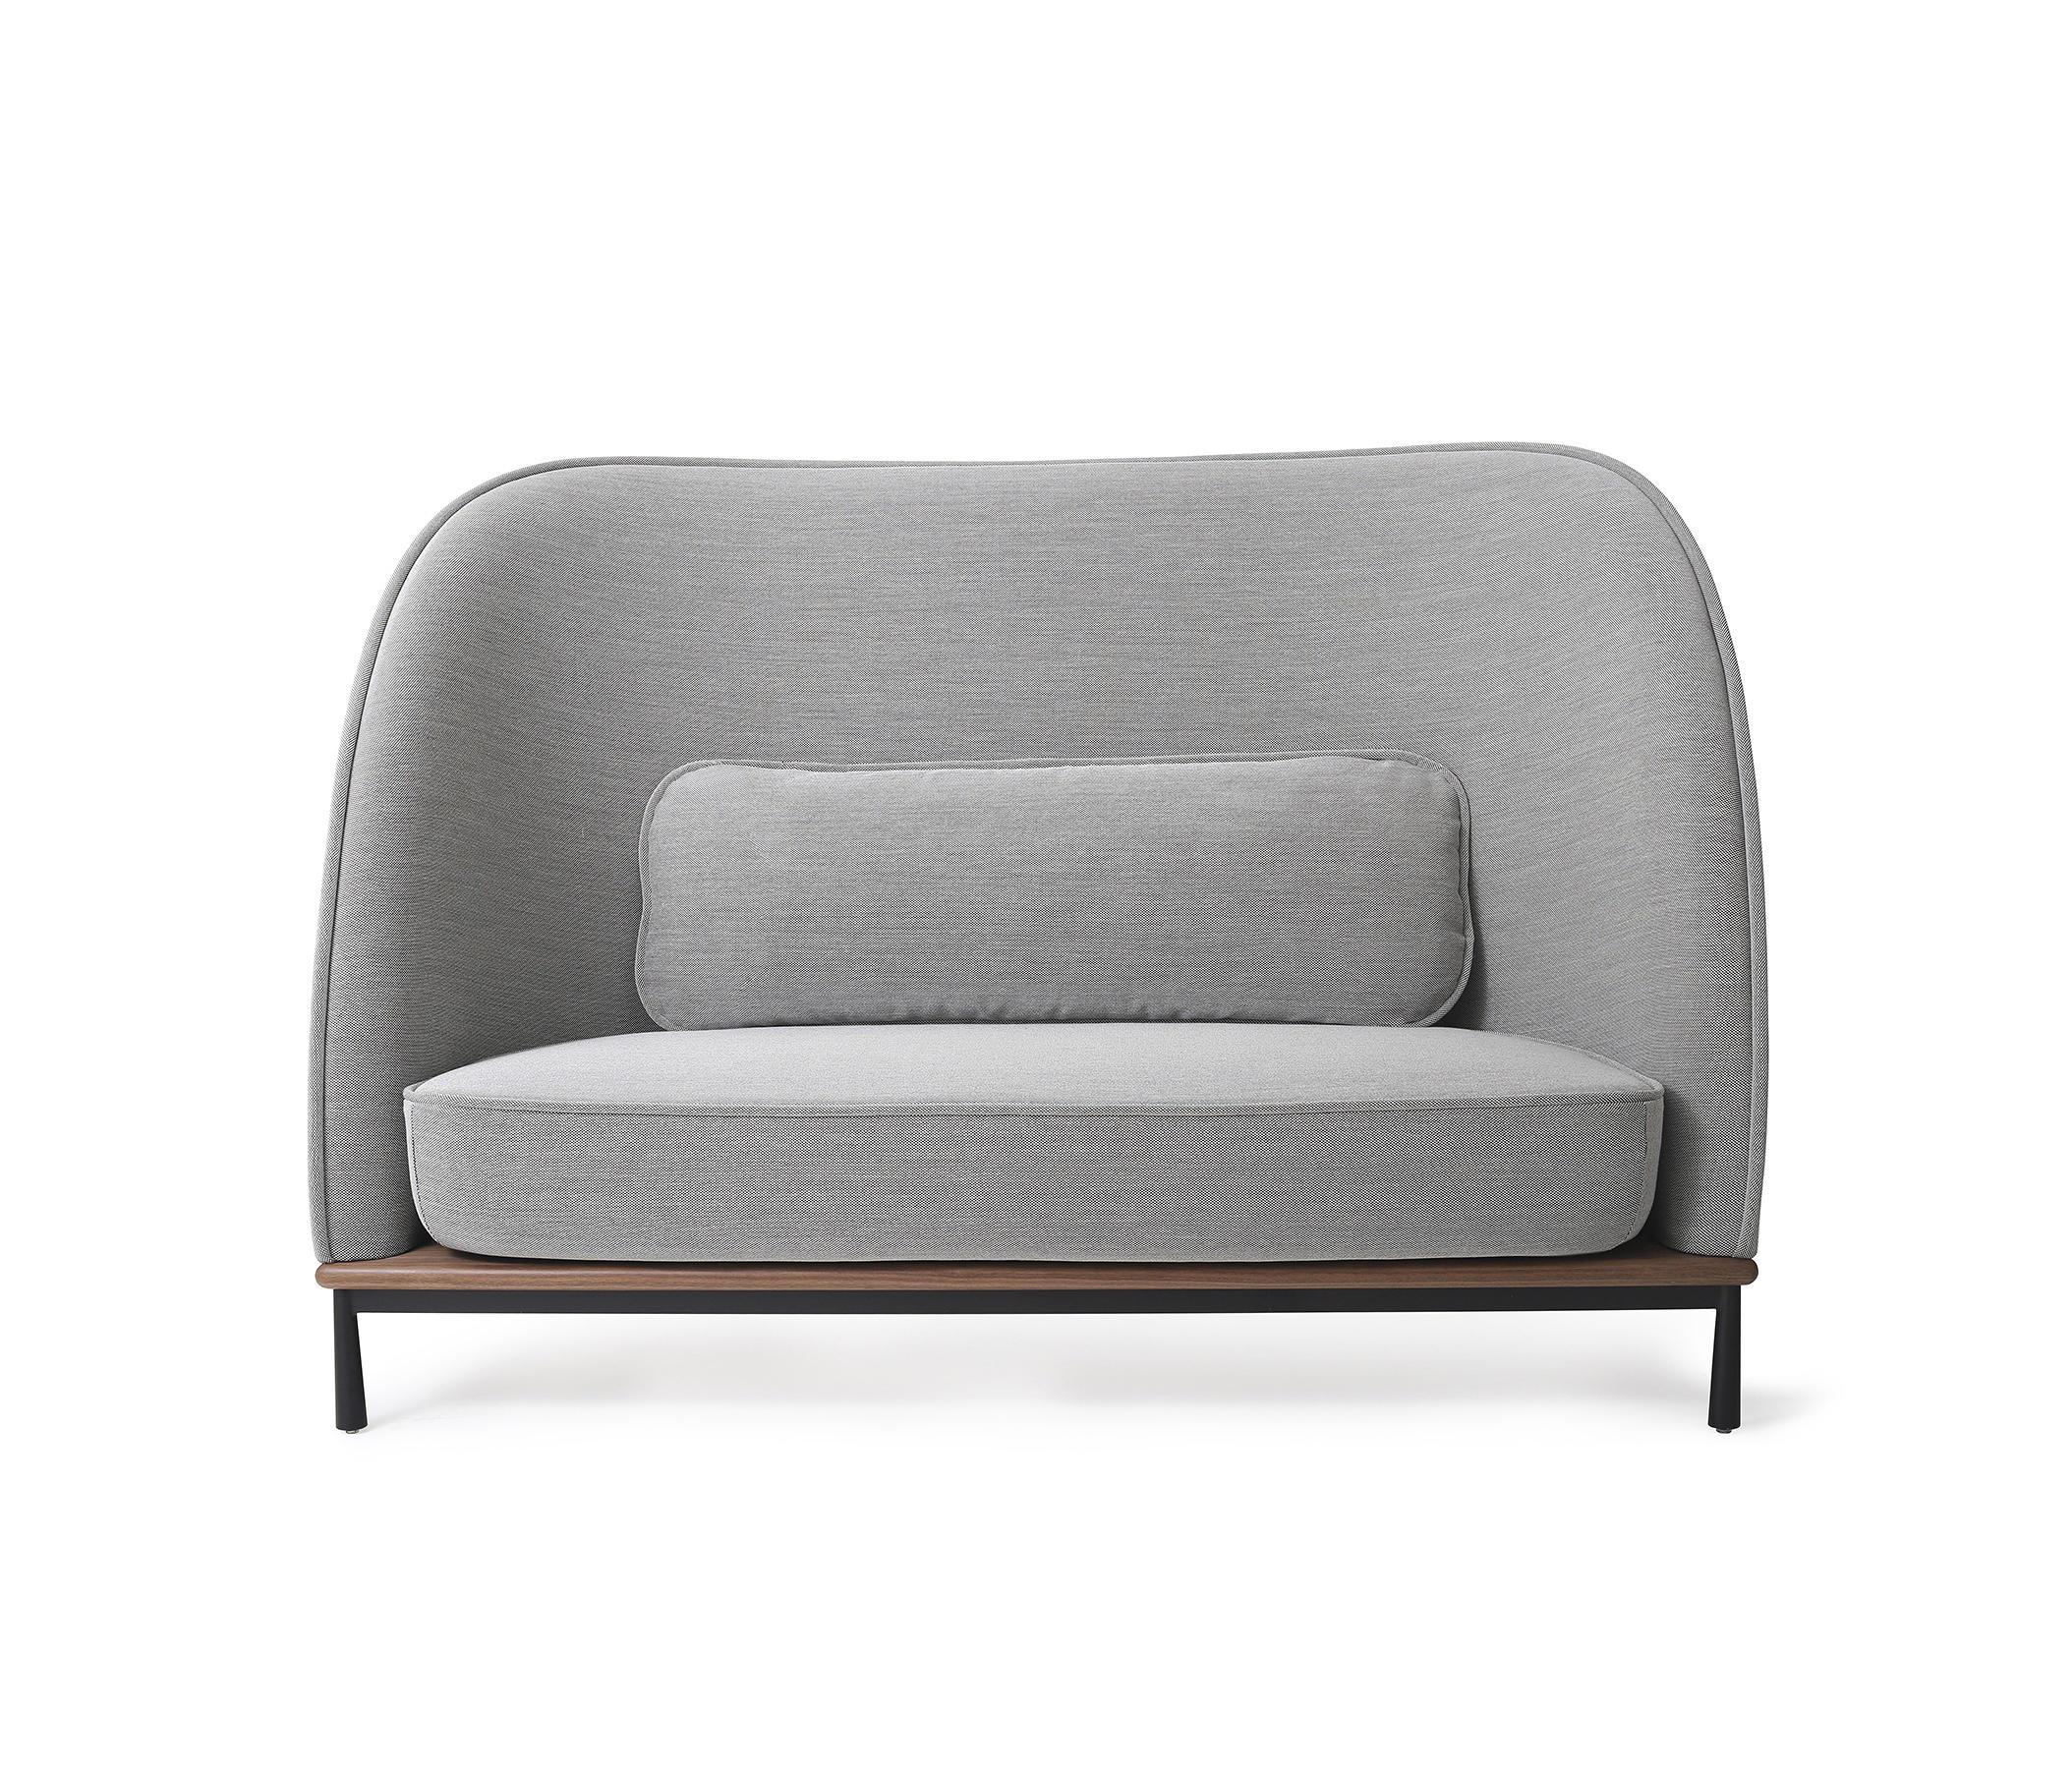 ARC SOFA HIGHBACK LOVE SEAT - Sofas from Stellar Works | Architonic